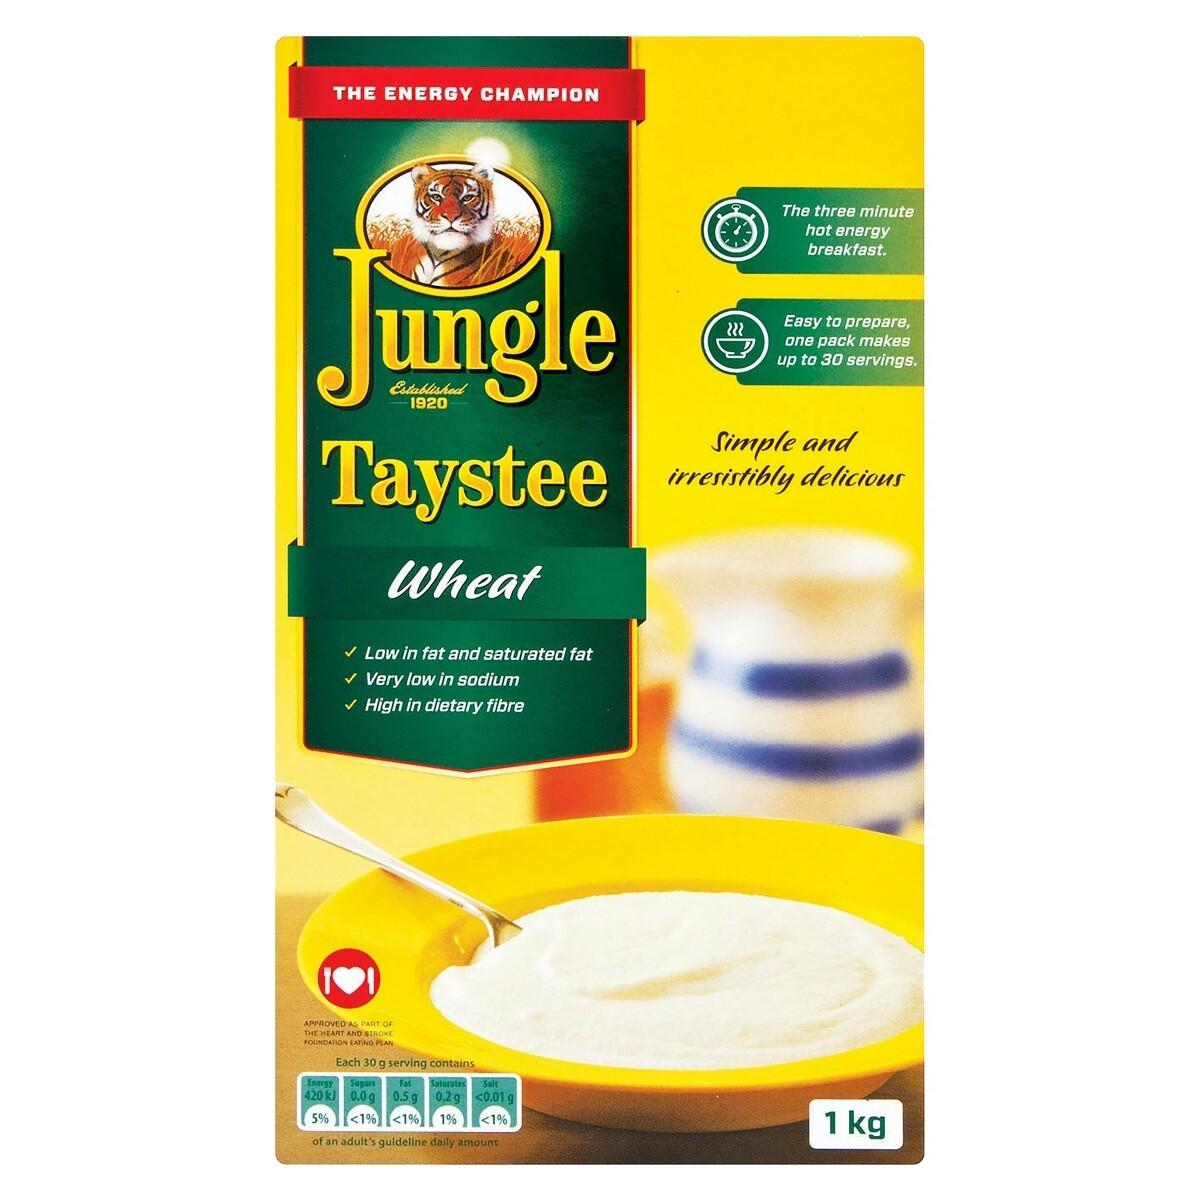 Jungle Tasytee Wheat Semolina 1kg